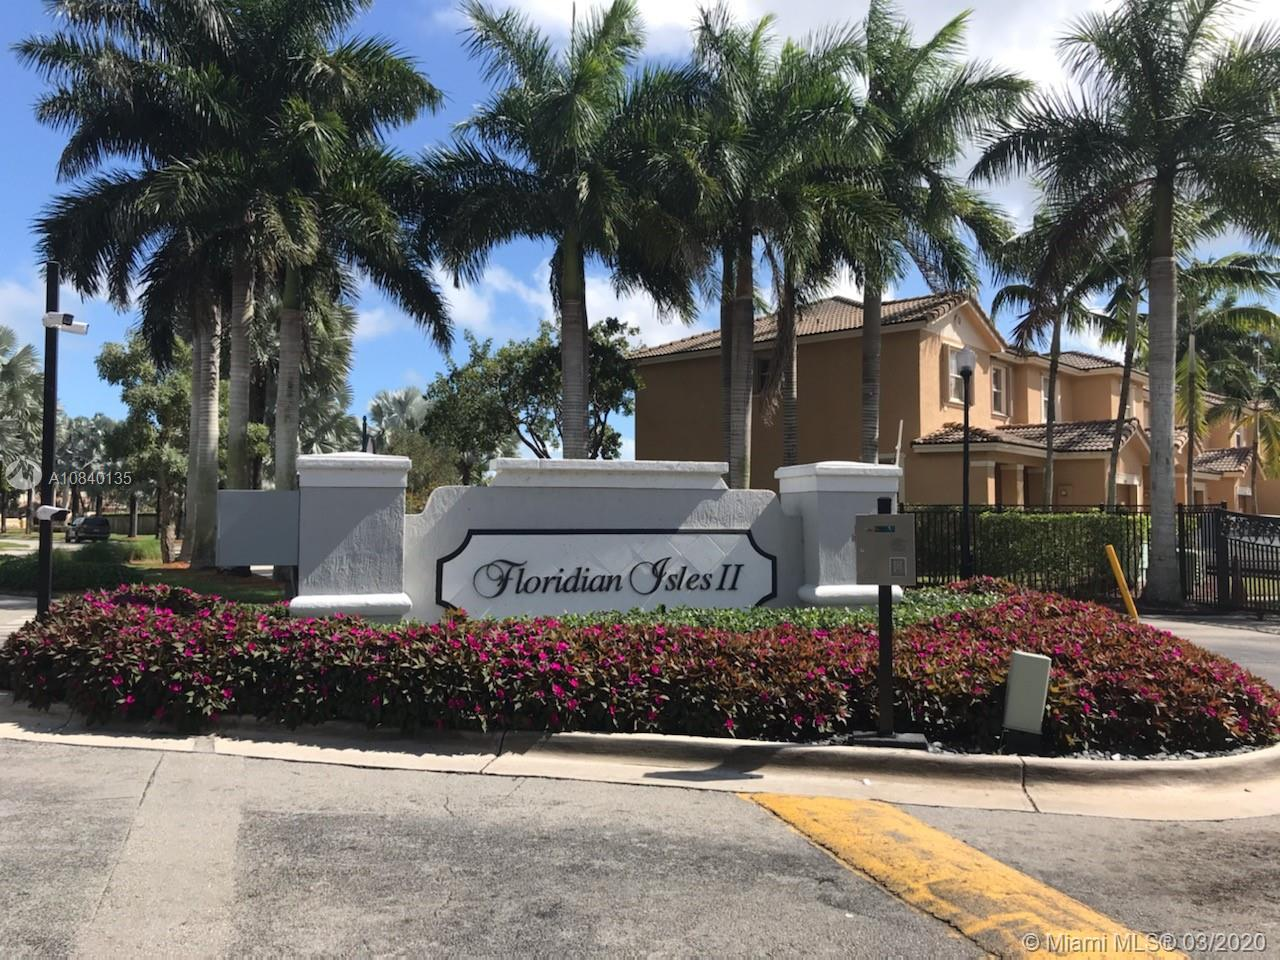 947 NE 41st Pl, Homestead, FL 33033 - Homestead, FL real estate listing